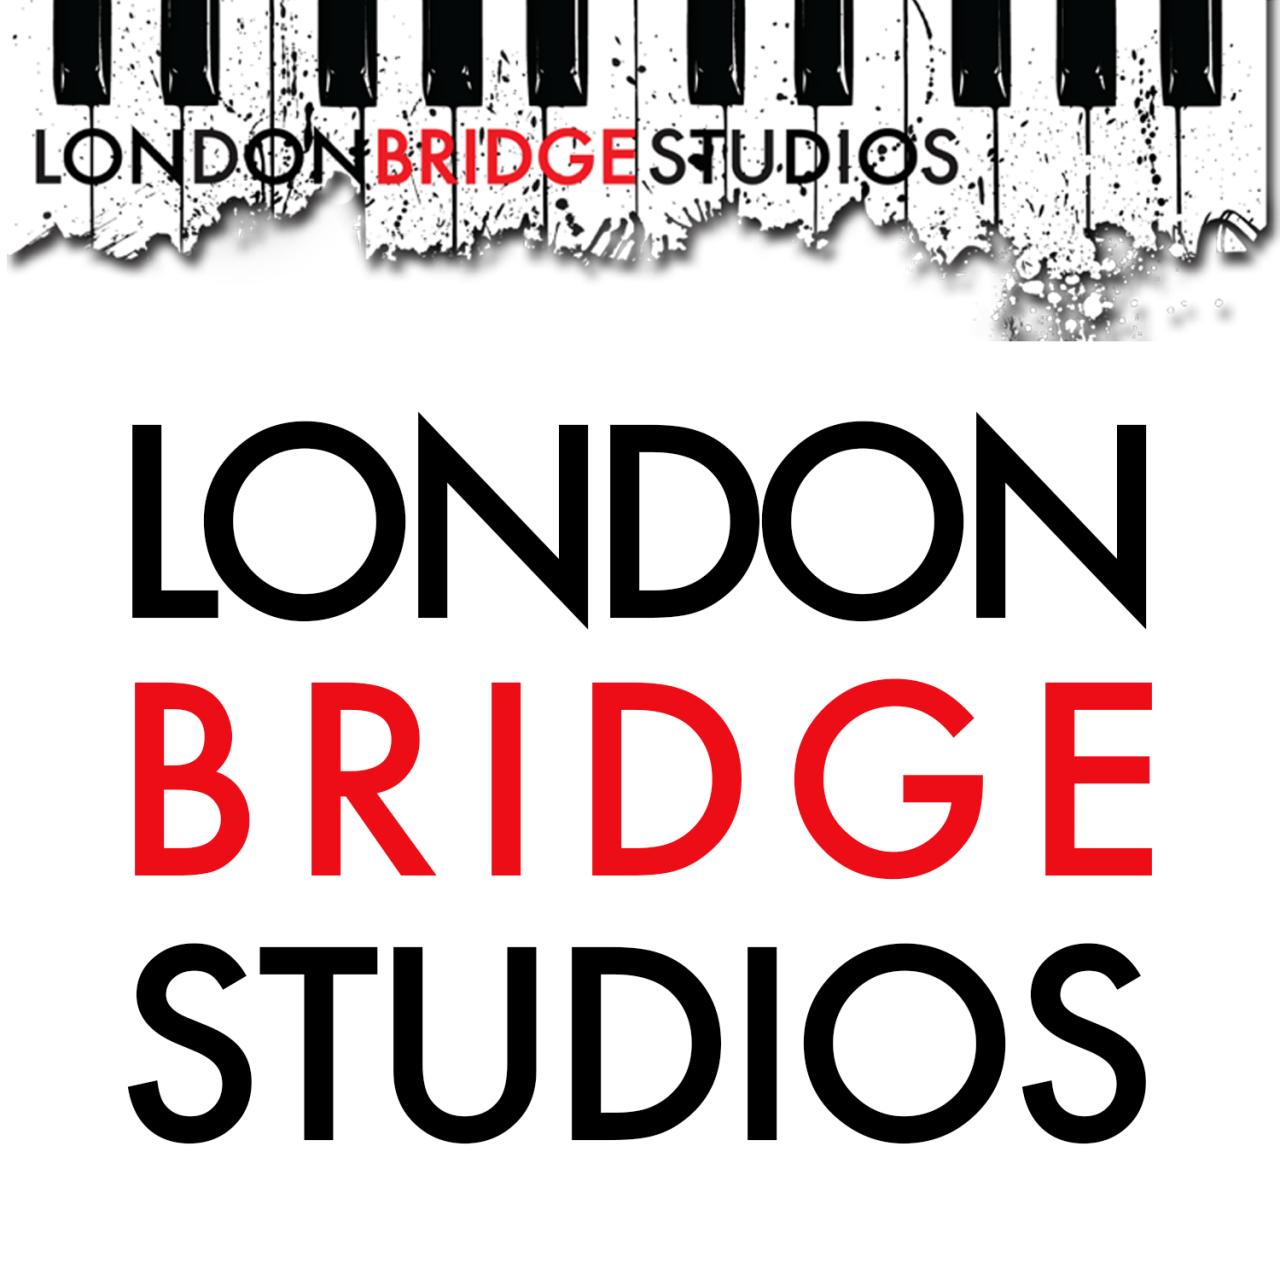 London Bridge Studios